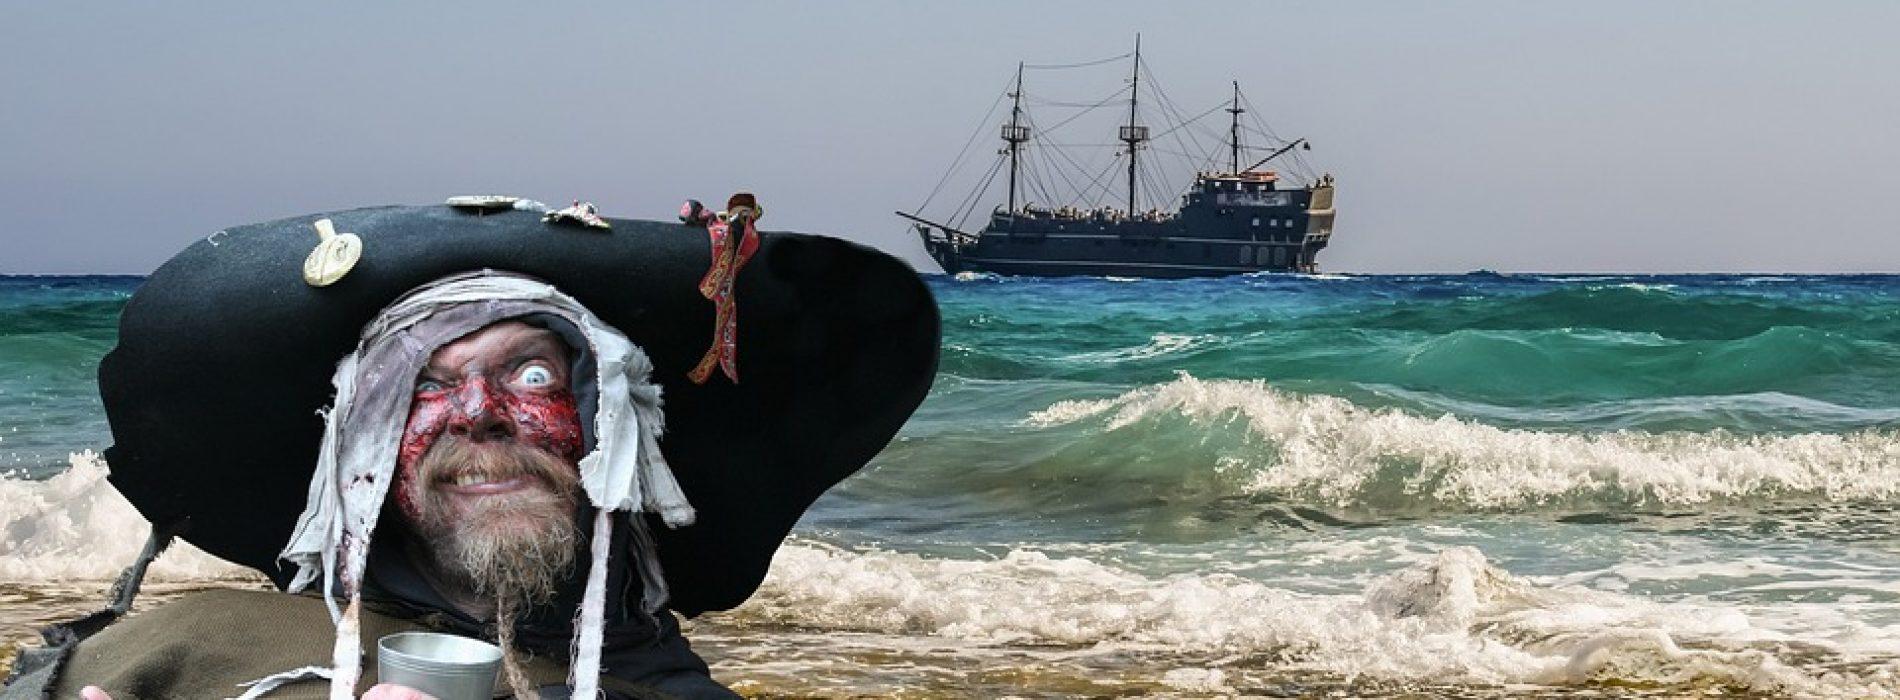 When Irish Pirates Ruled the Seas